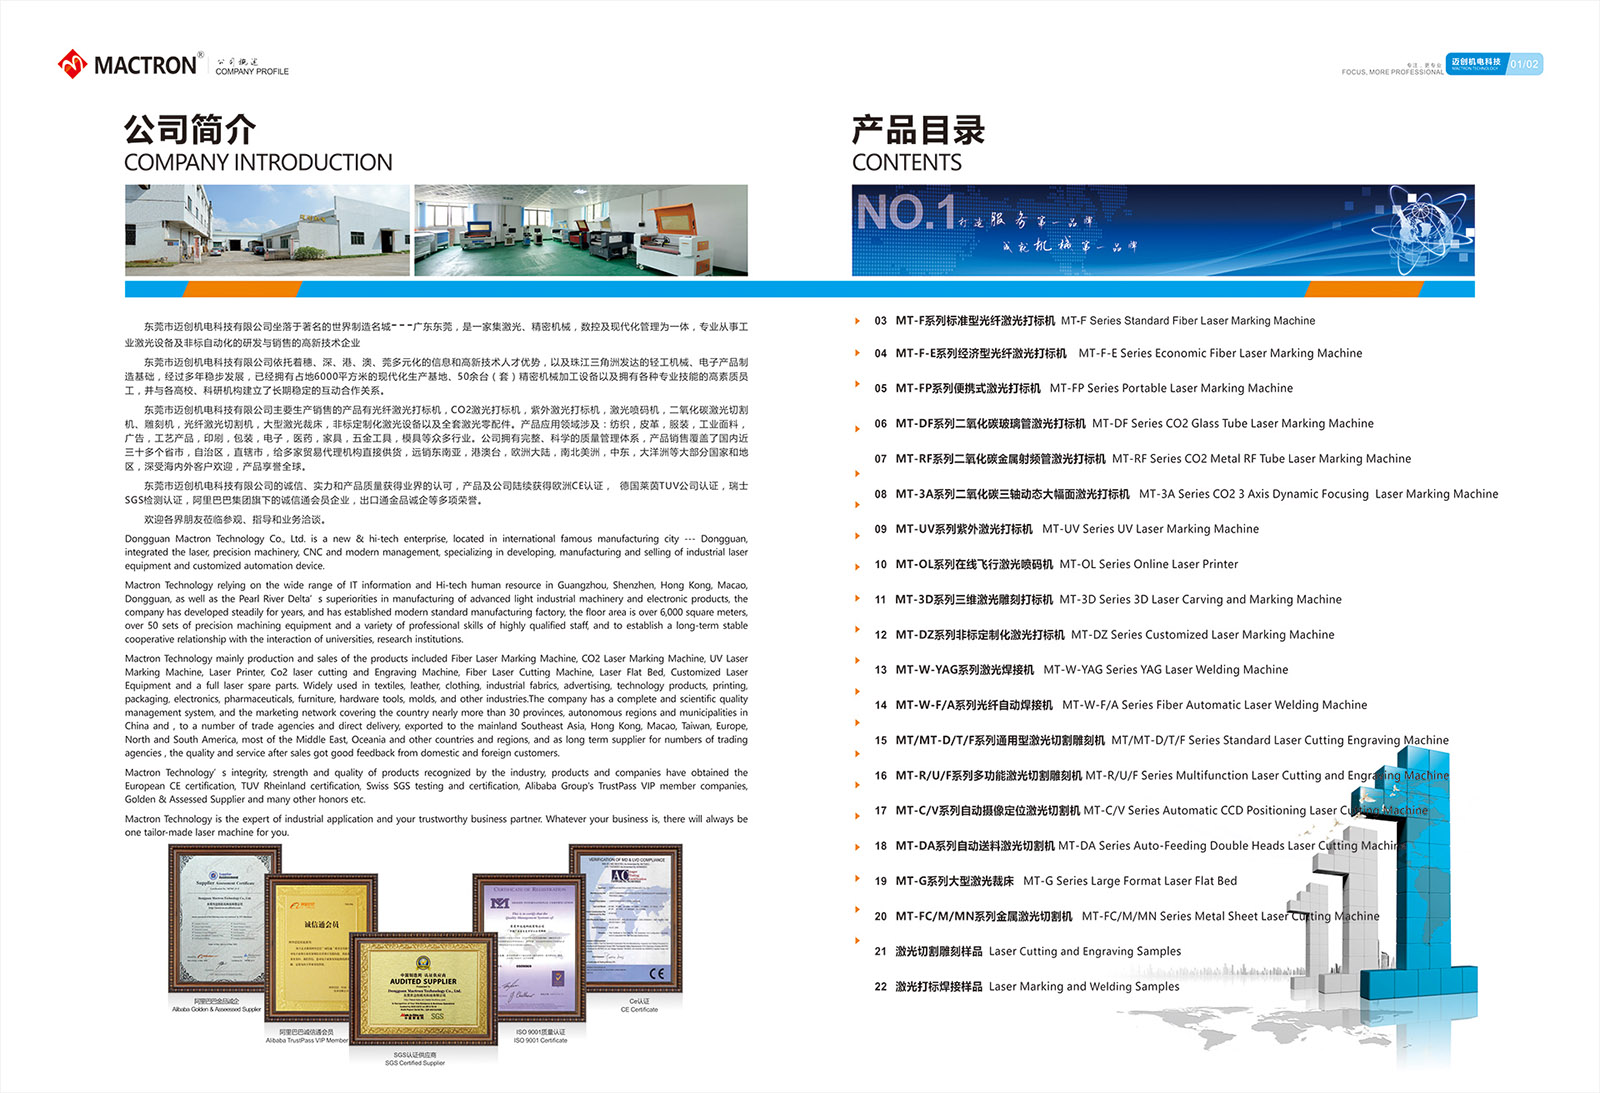 Mactron Tech Laser Catalogue 2017 (2)